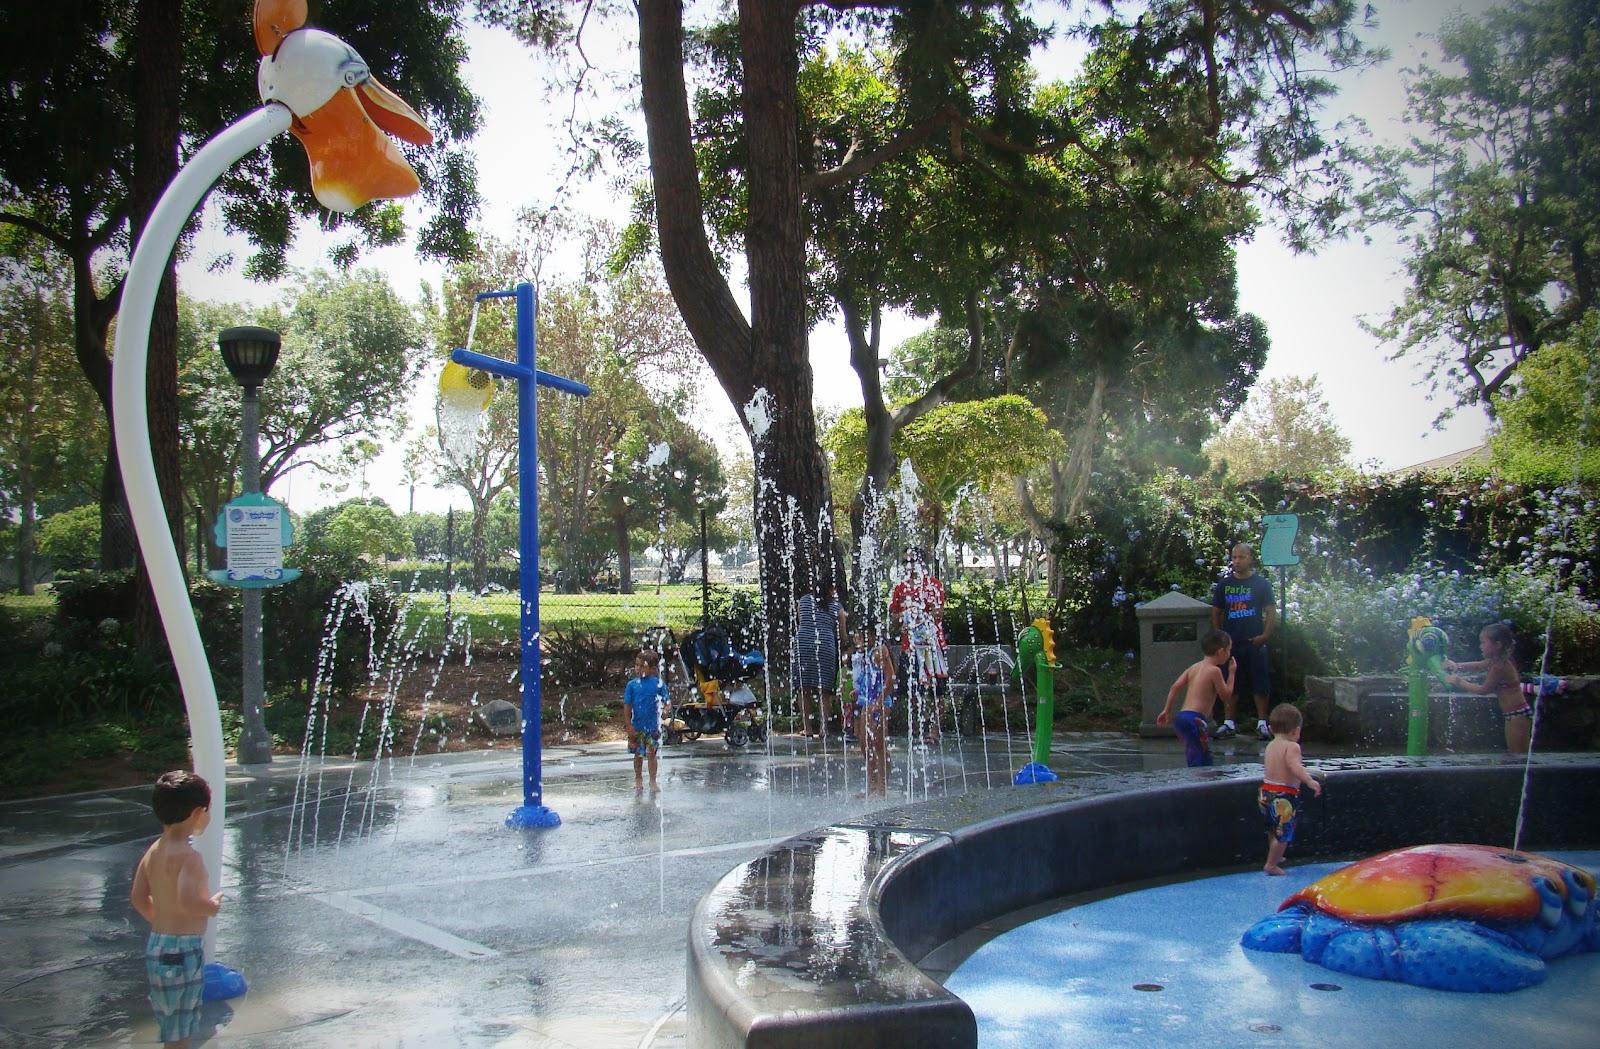 Atlantis Play Center Splash Pad Toddler Trails